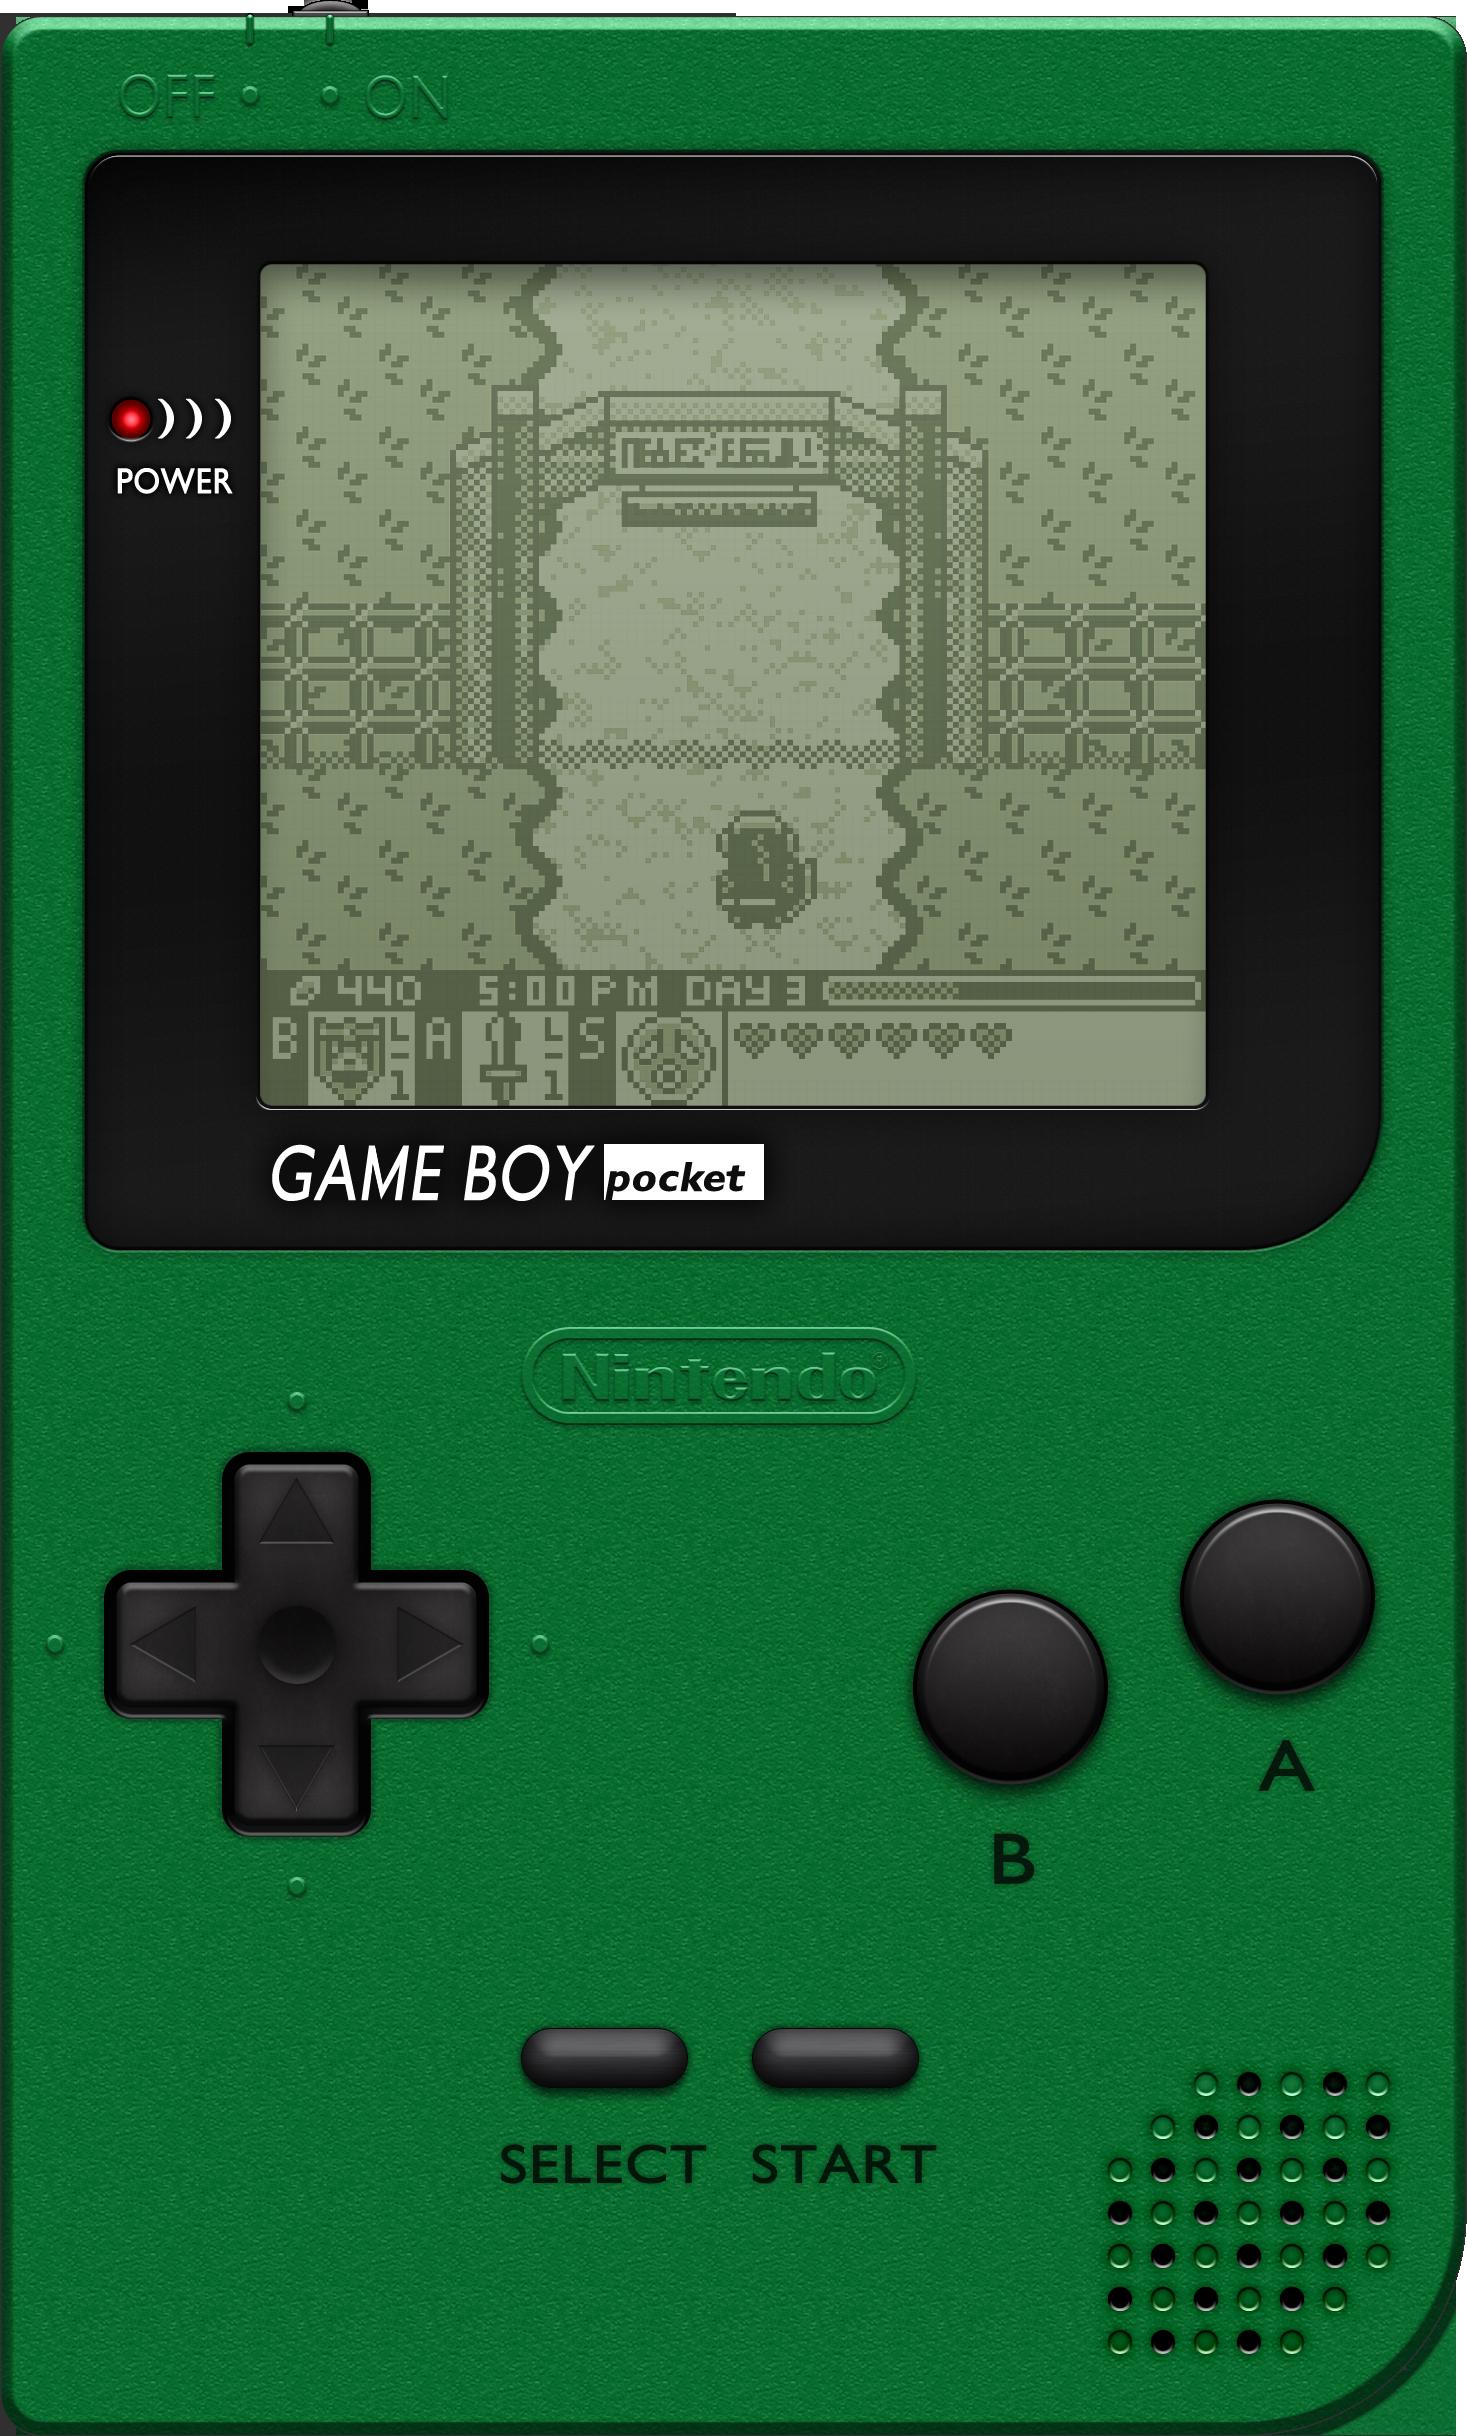 Game boy color palette - Blueamnesiac 24 13 Nintendo Game Boy Pocket Green By Blueamnesiac